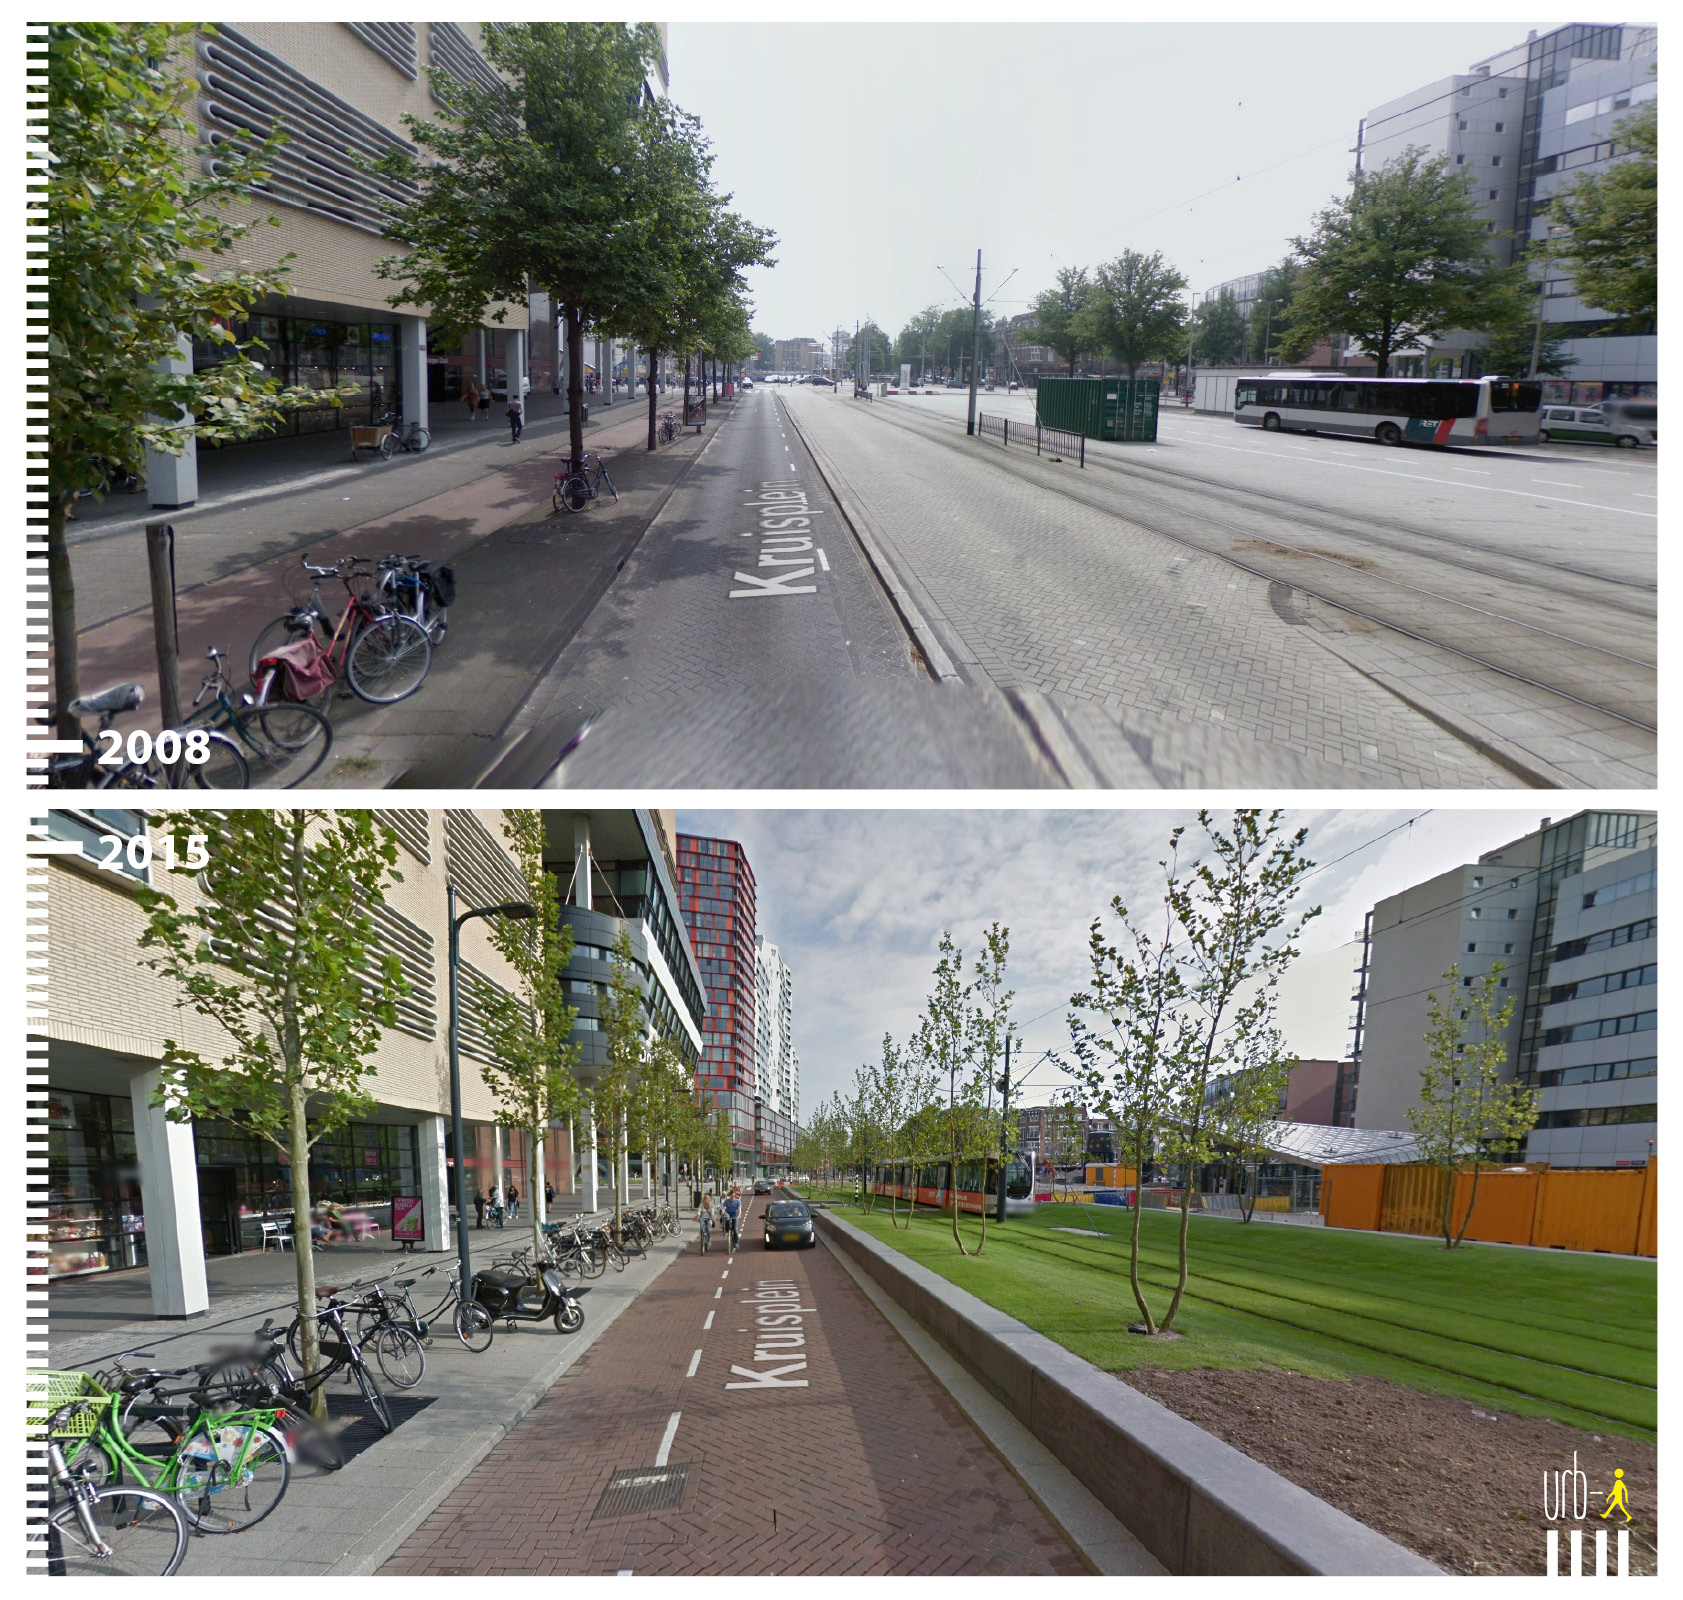 2100 NL Rotterdam, Kruisplein